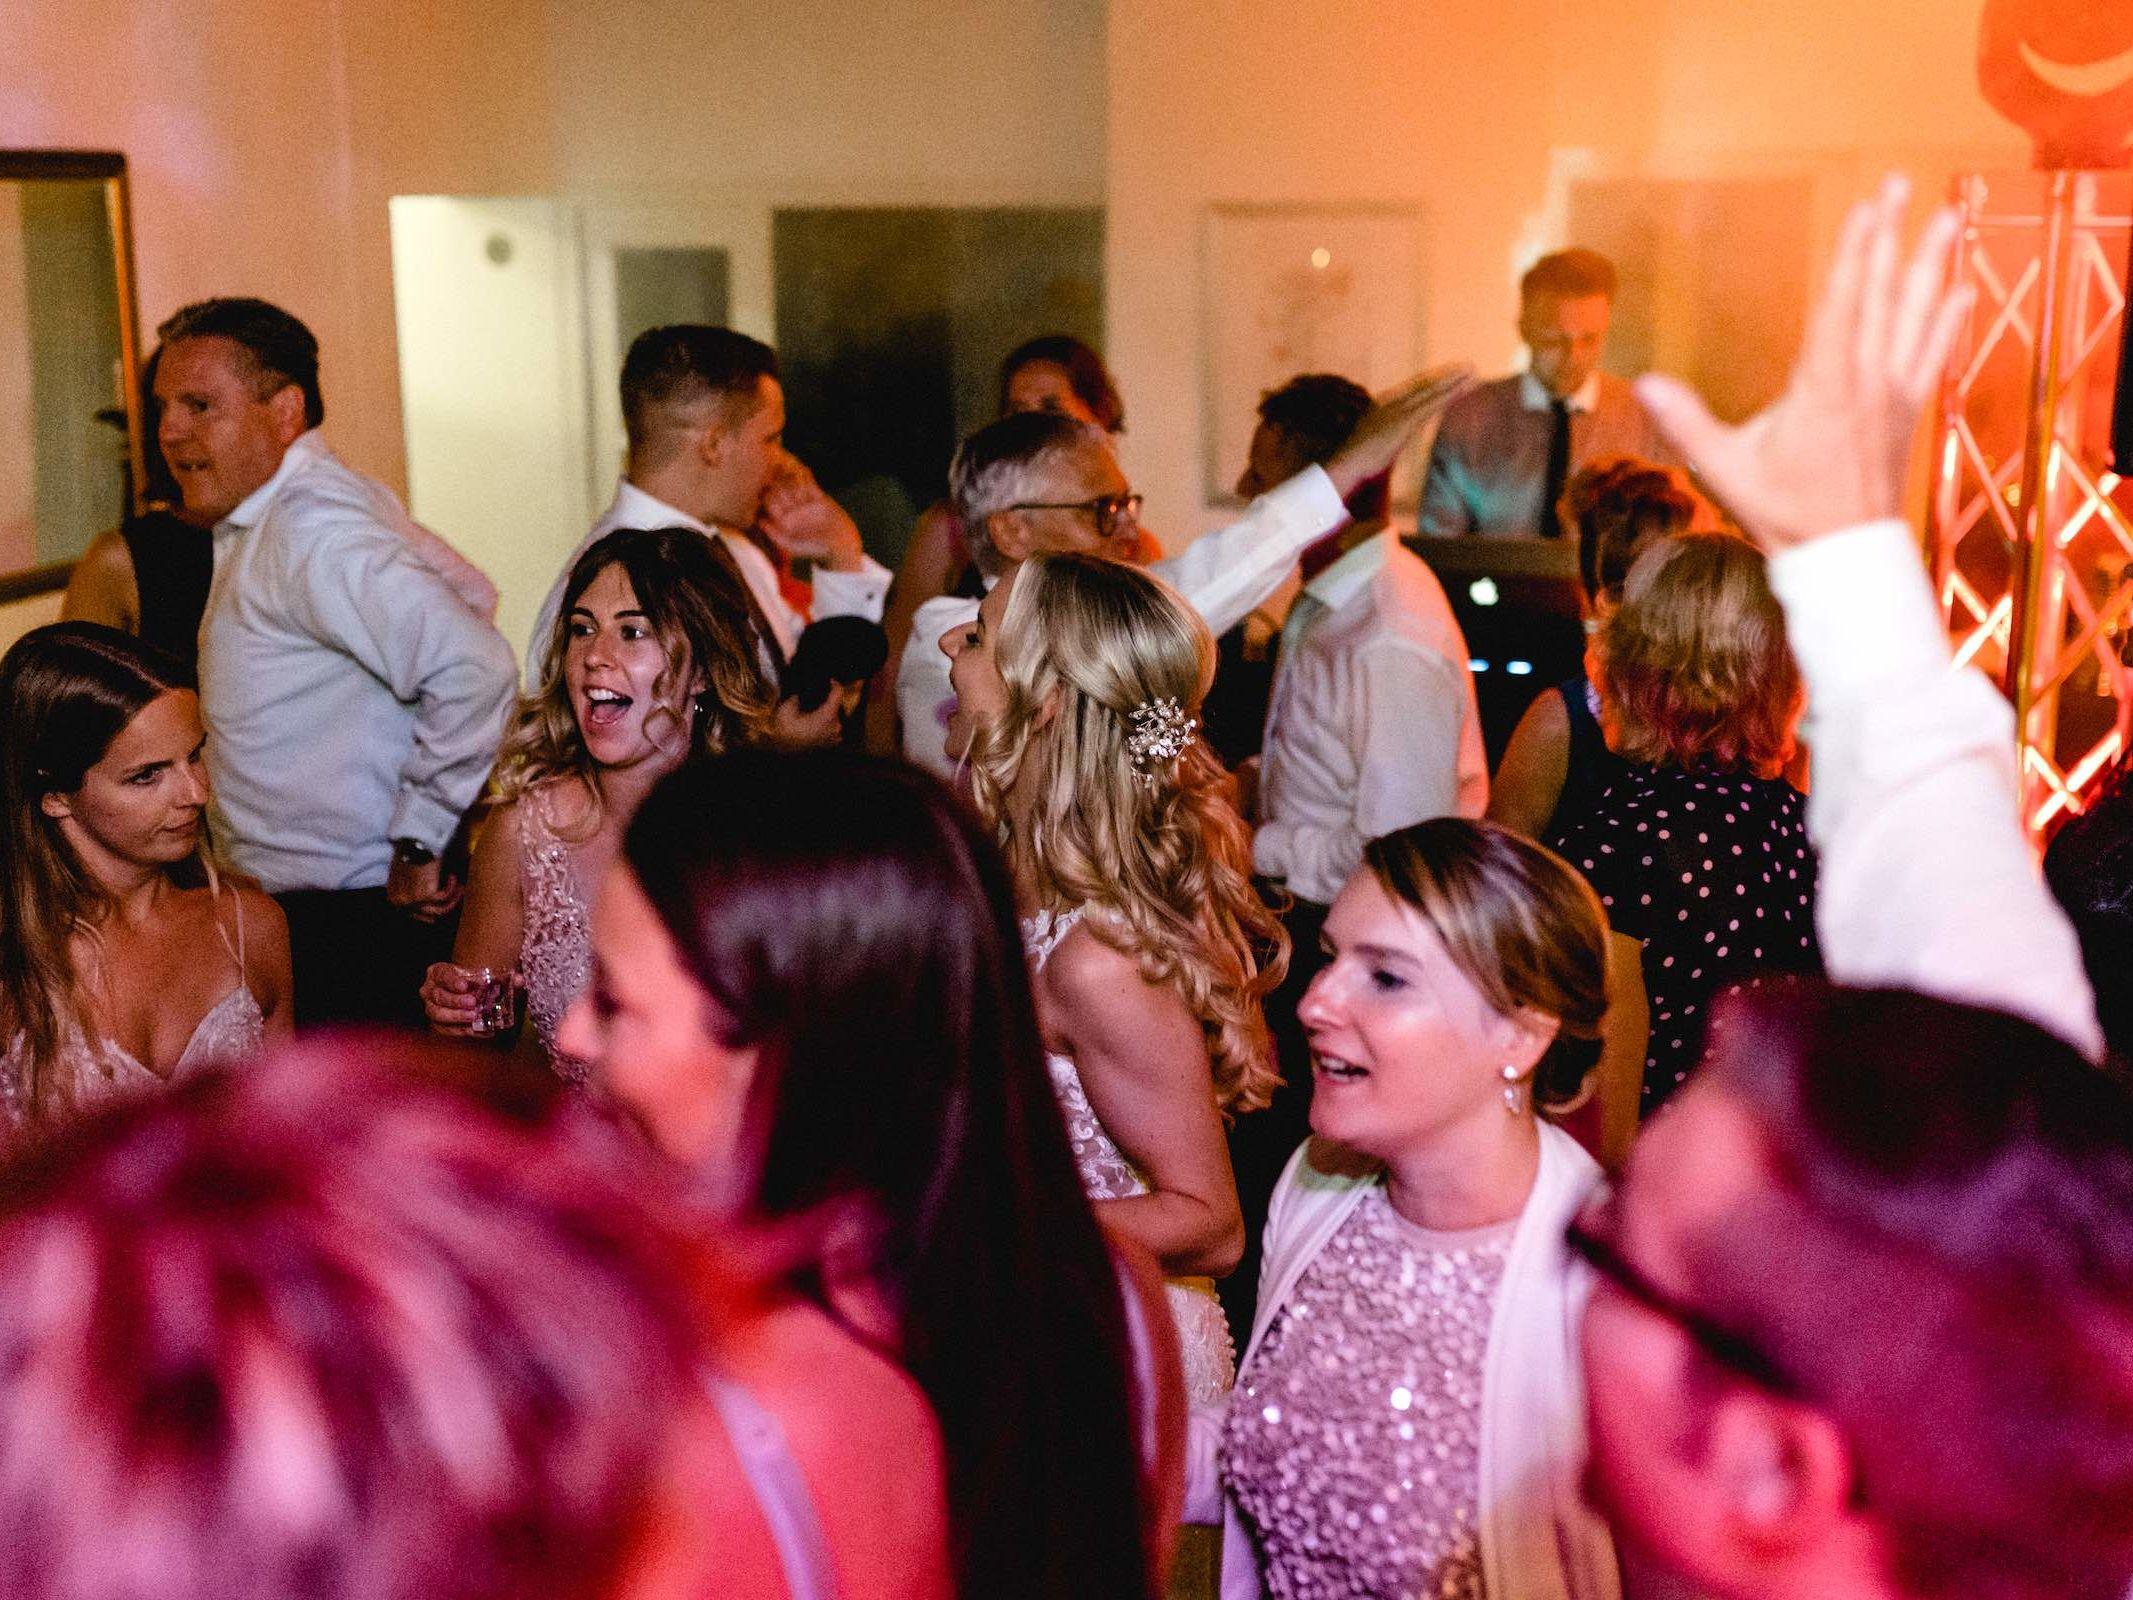 Dj | Hannover | Hochzeit | DJ | Buchen | Hannover | DJ | Firmenfeier | DJ | Geburtstag | DJ | Betriebsfeier | DJ | Buchen | Discjockey | Mieten | DJ | Agentur | DJ | Timm | Lehmann | Eventservice